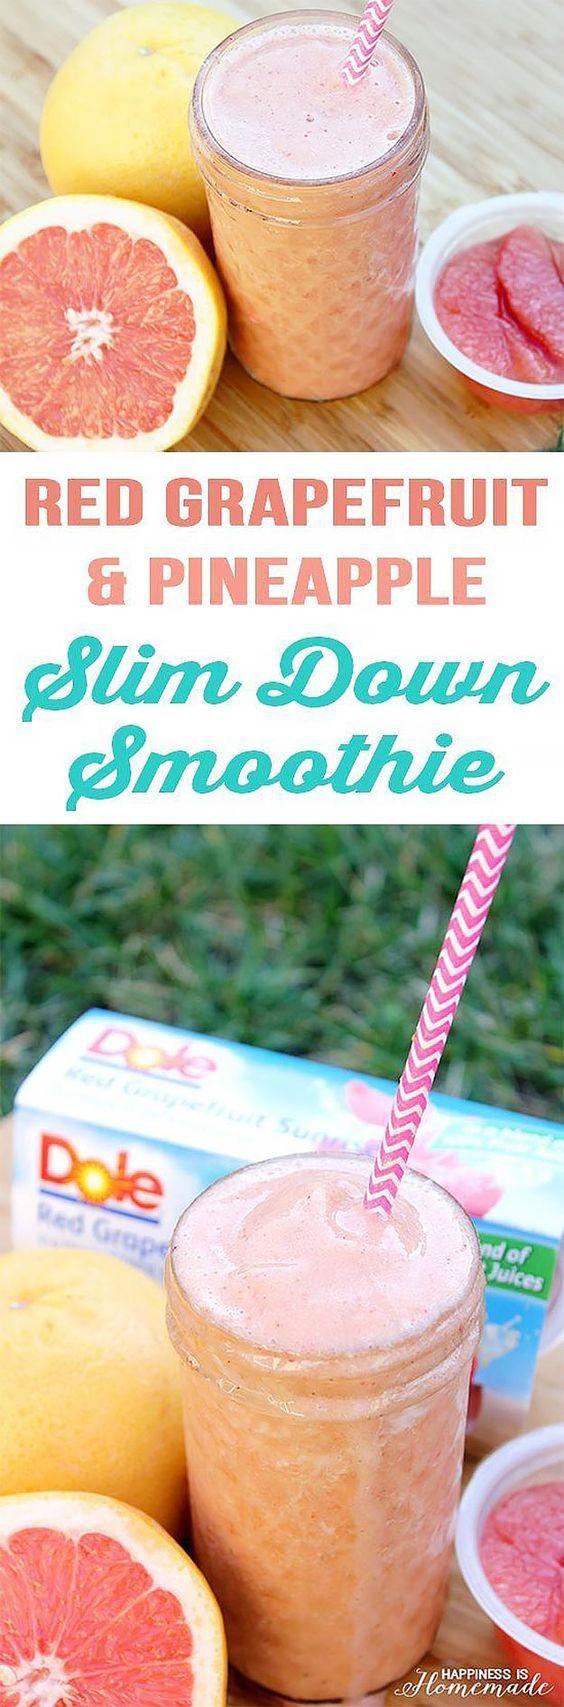 31 Healthy Smoothie Recipes